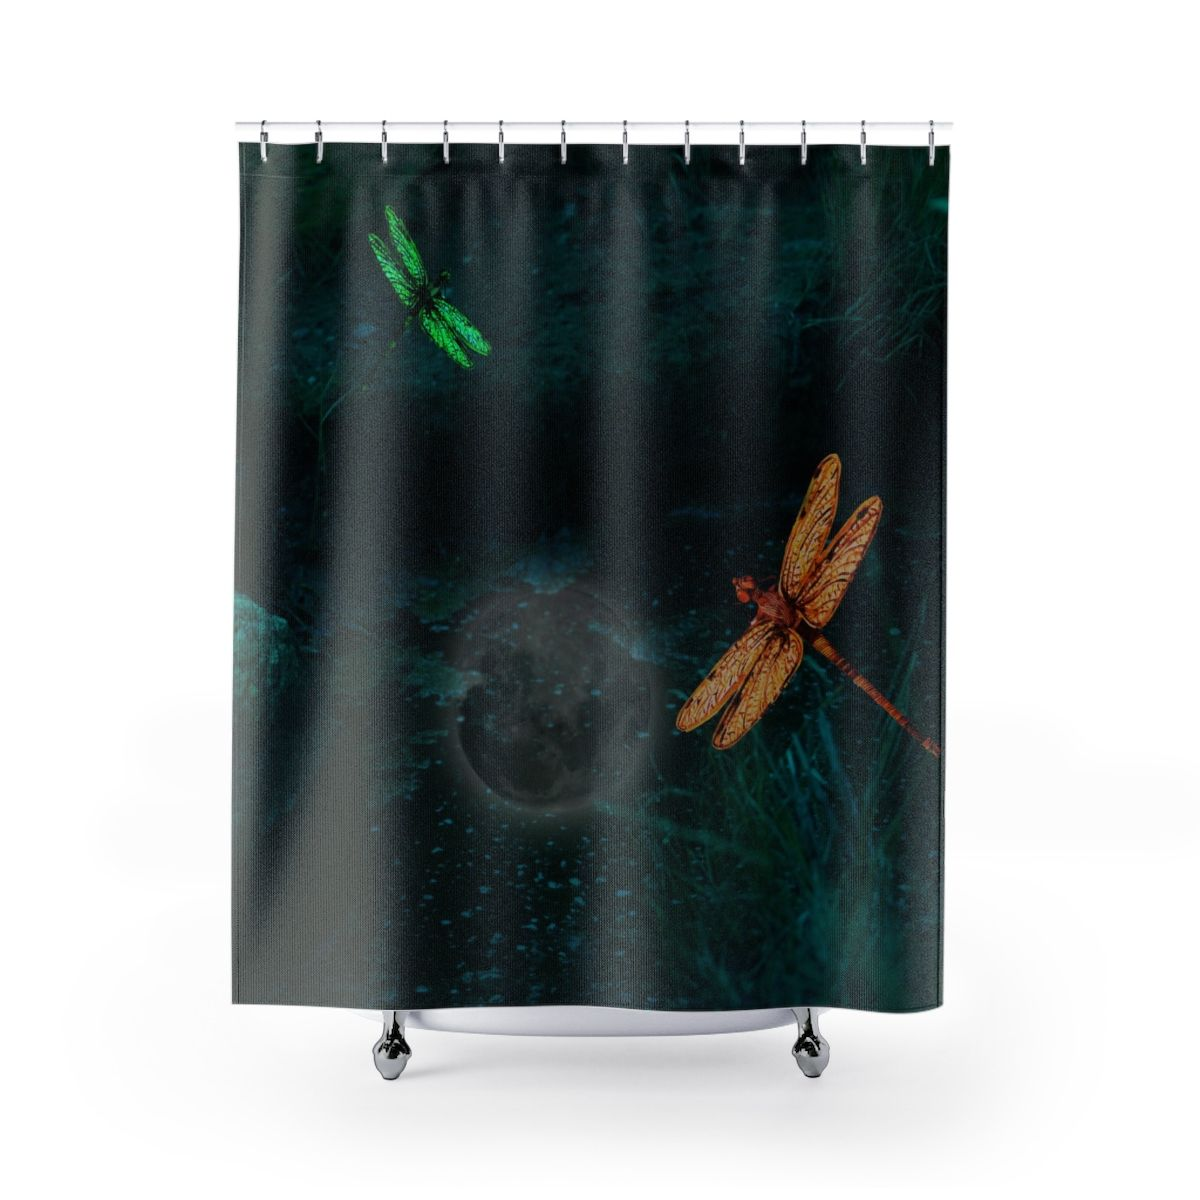 Dragon Fly Shower Curtain Bathroom Decor Dragonflies Art